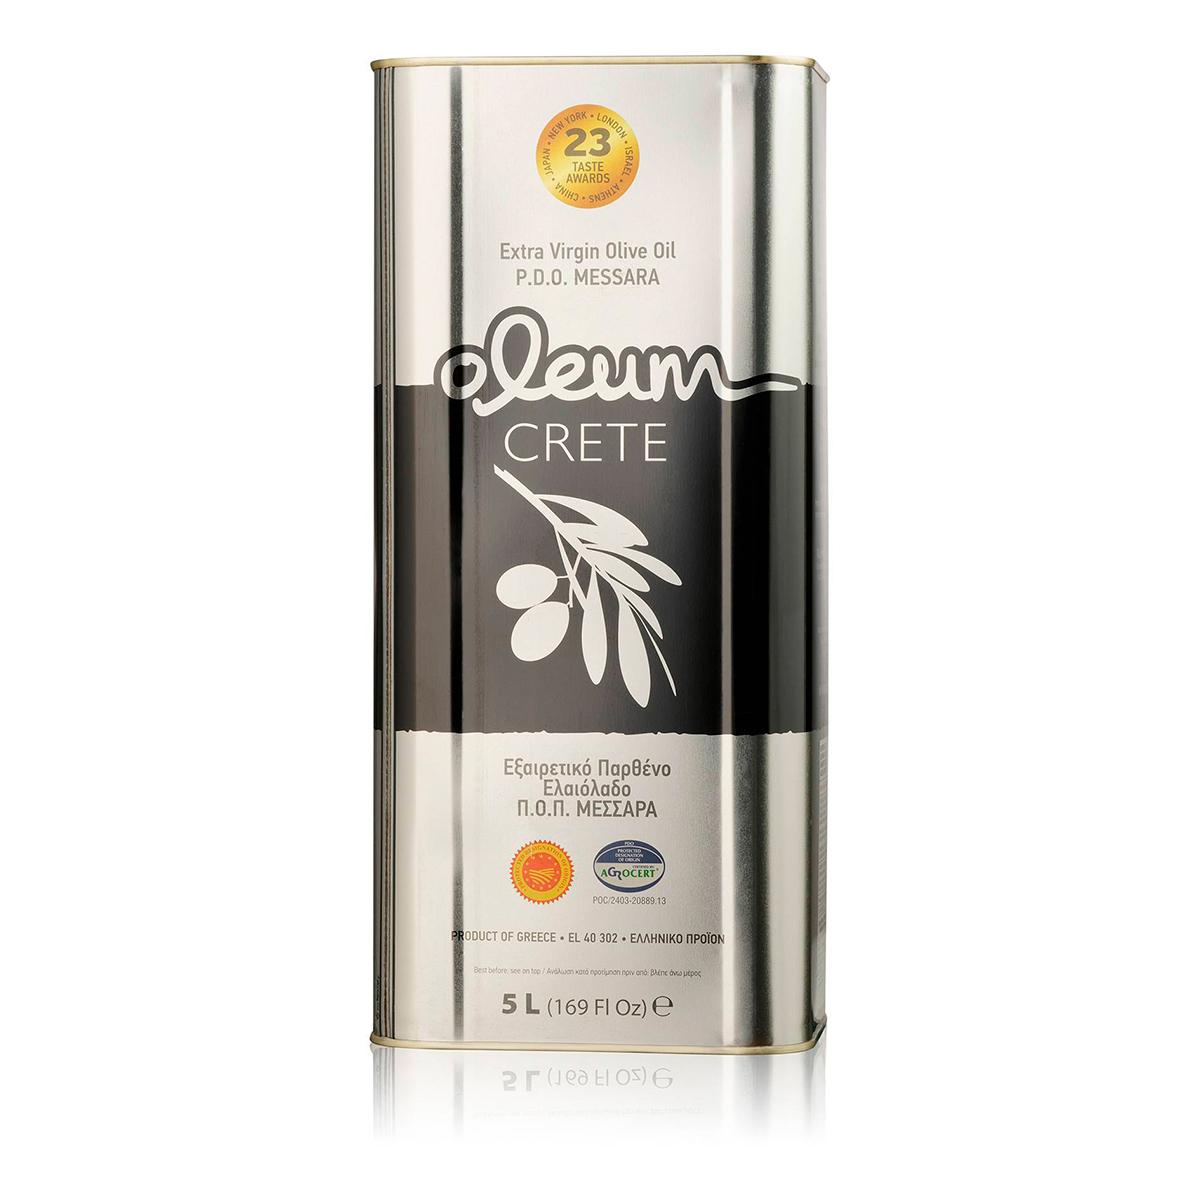 Масло оливковое Extra Virgin OLEUM CRETE P.D.O. 5л